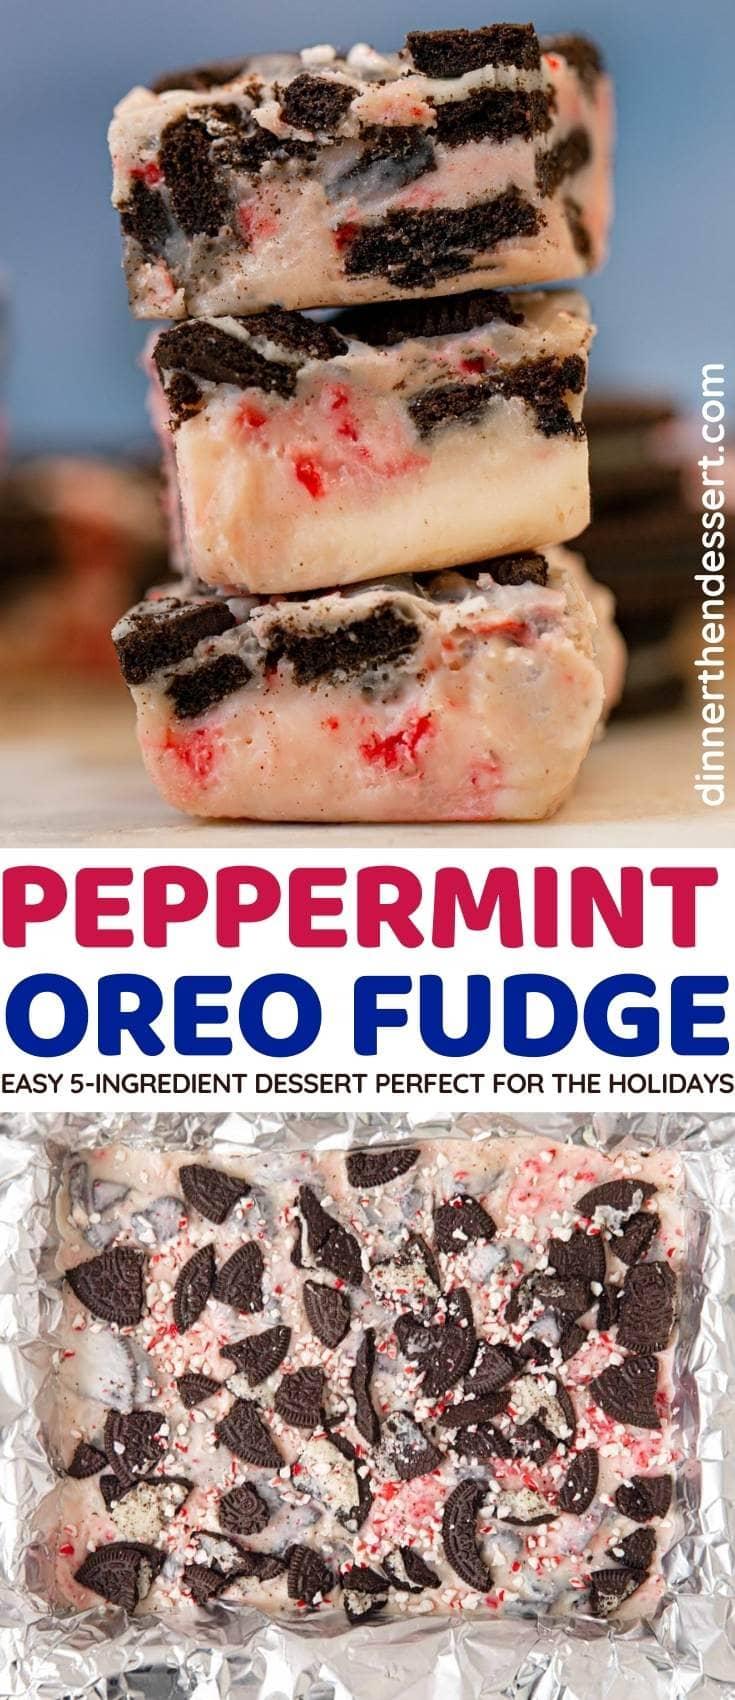 Peppermint Oreo Fudge collage